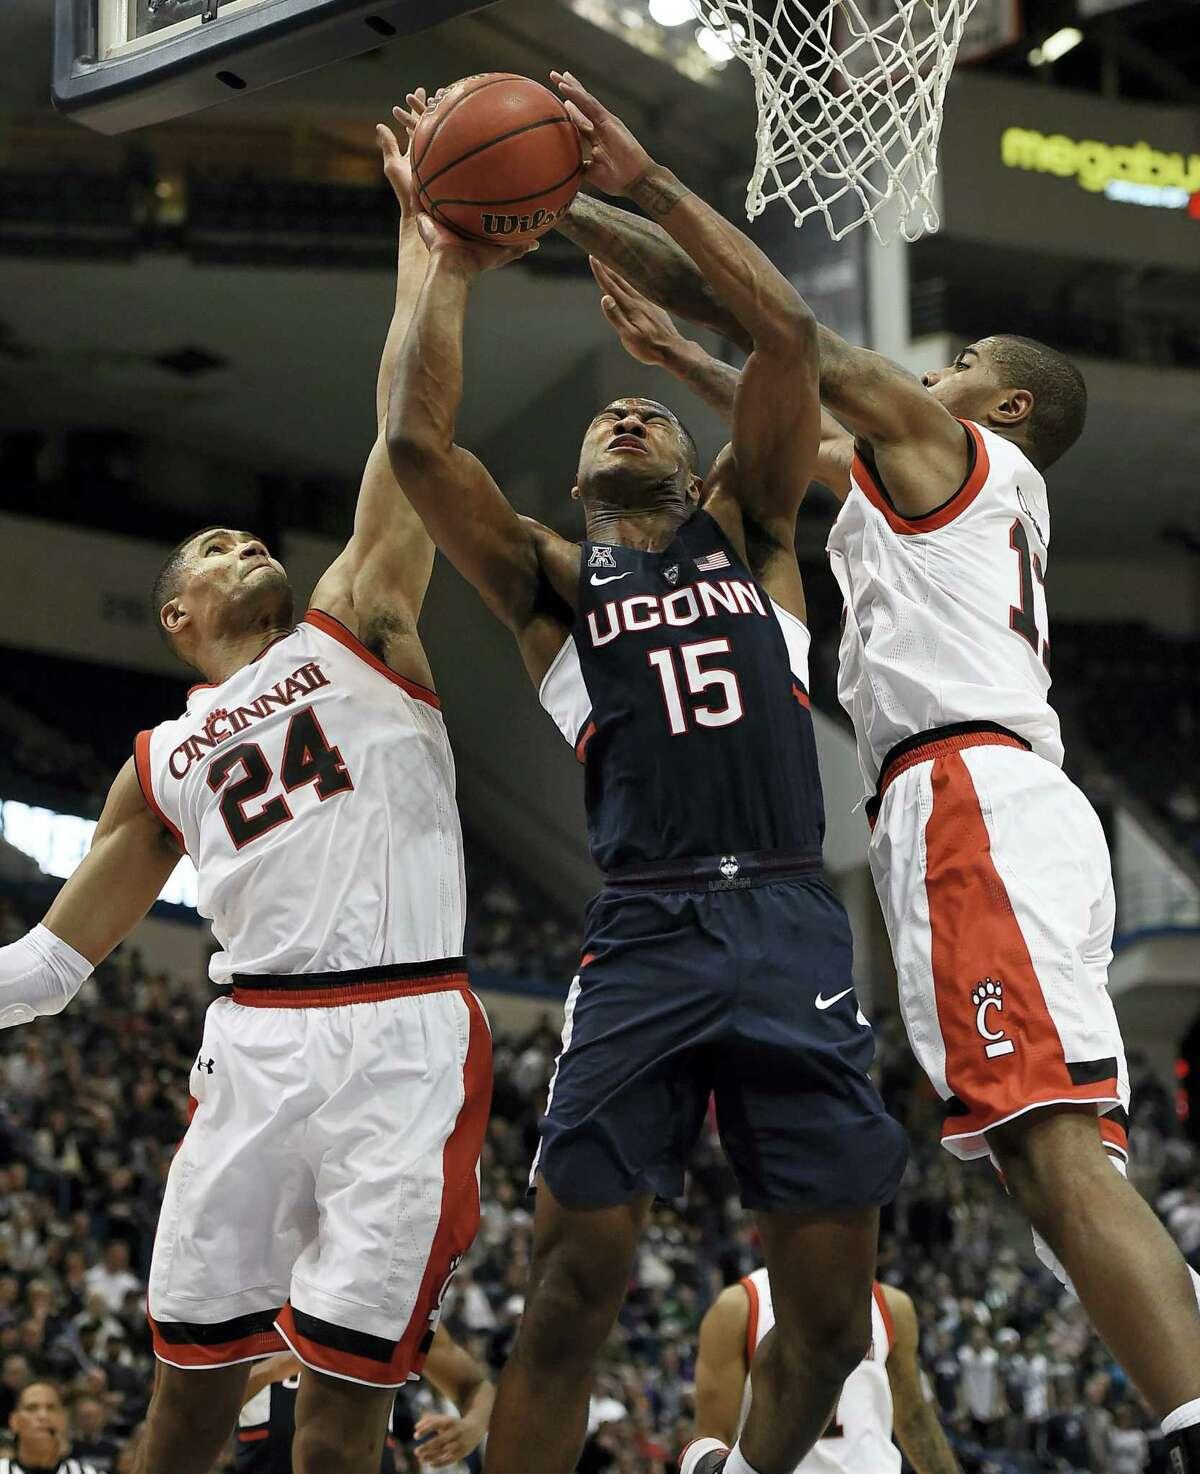 Cincinnati's Kyle Washington, left, fouls UConn's Rodney Purvis during the second half.